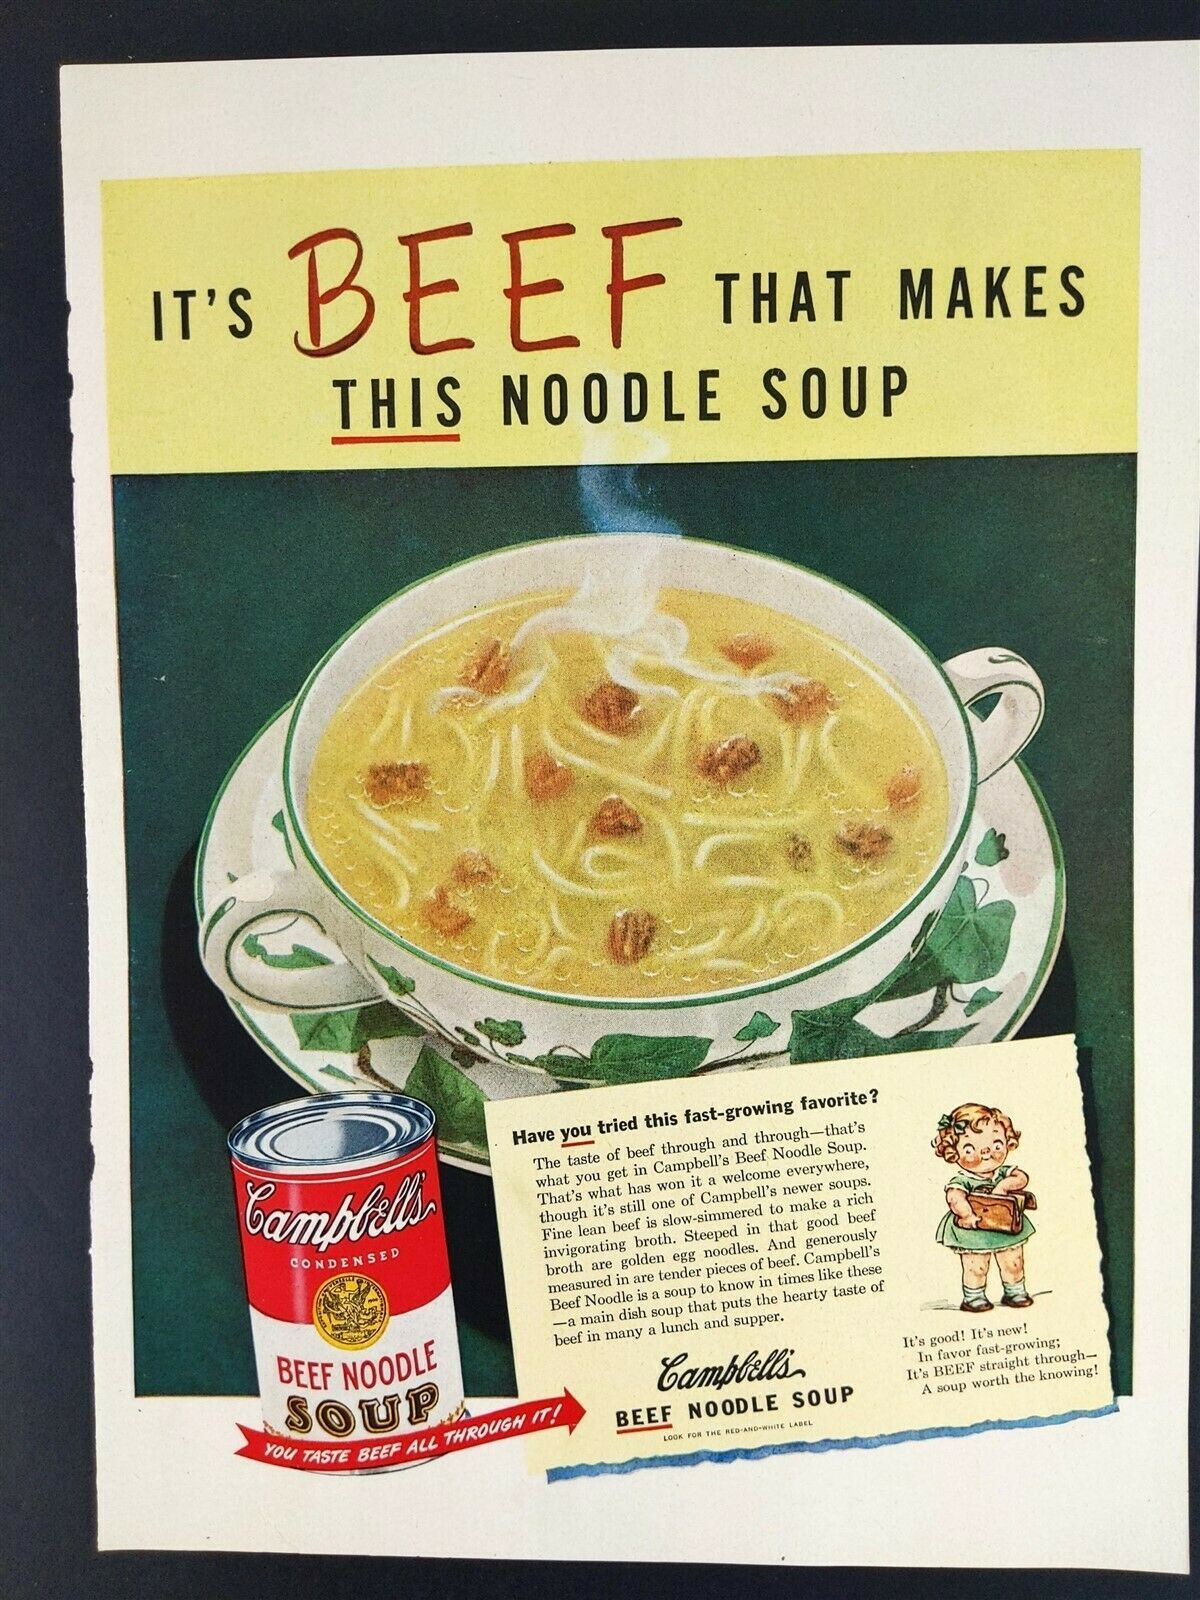 1948 Campbell's Beef Noodle Soup Vintage Magazine Print Ad